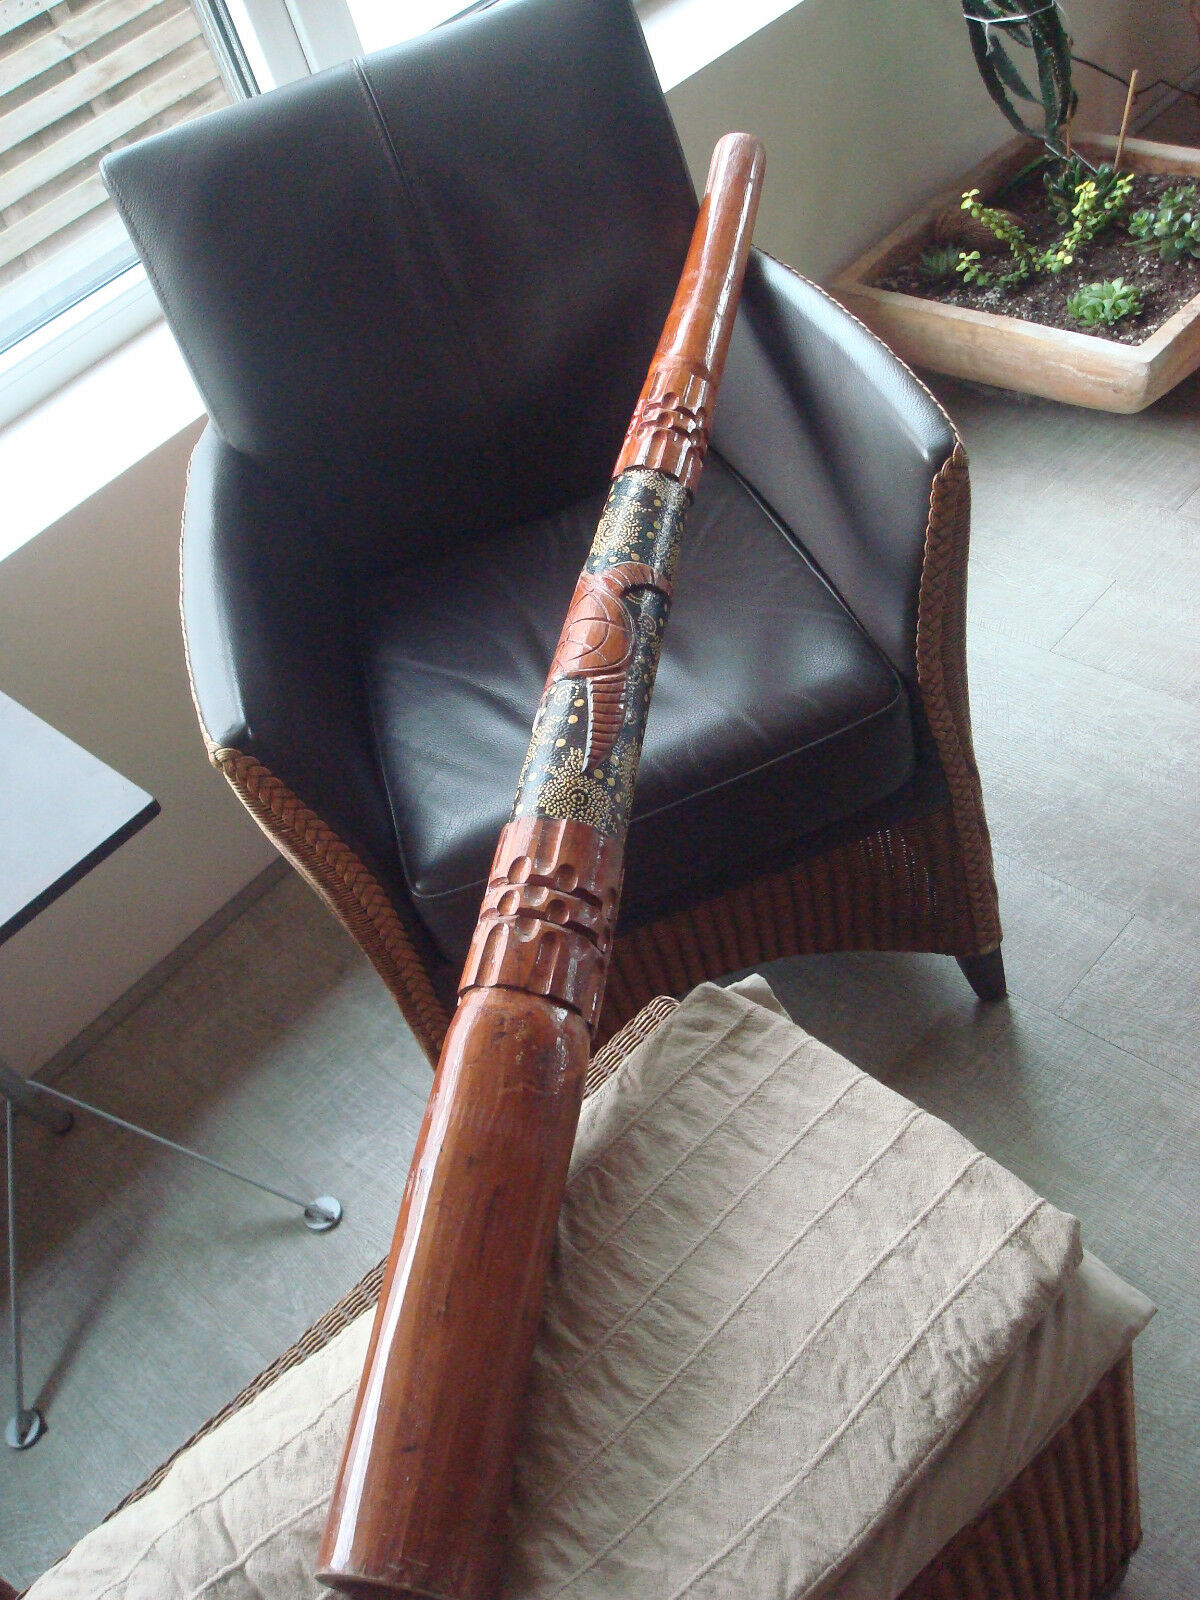 Didgeridoo Kunstvoll geschnitzt und bemalt